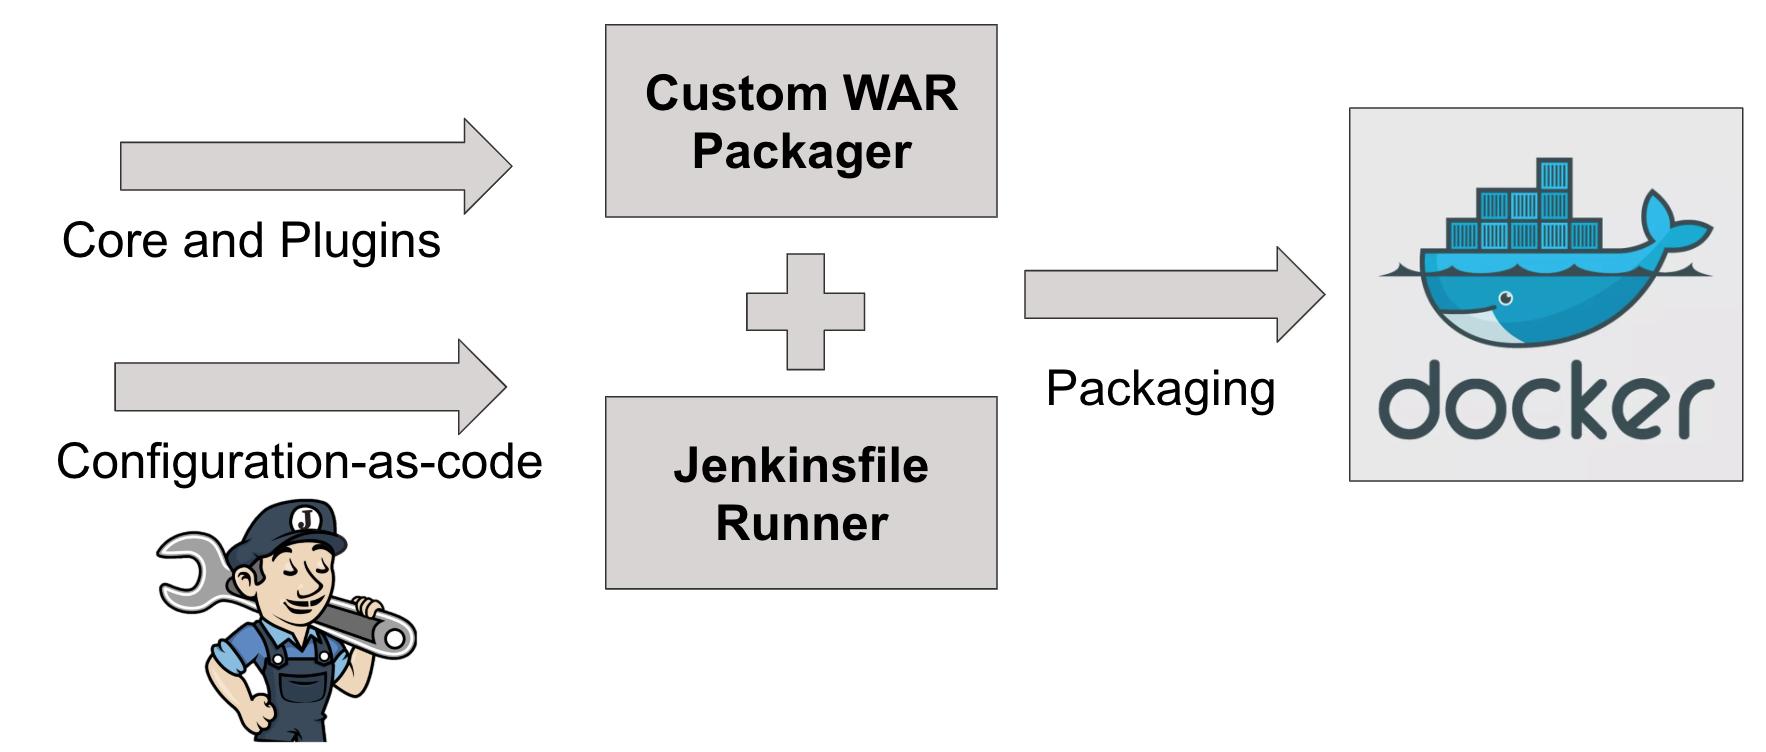 Custom WAR Packager build flow